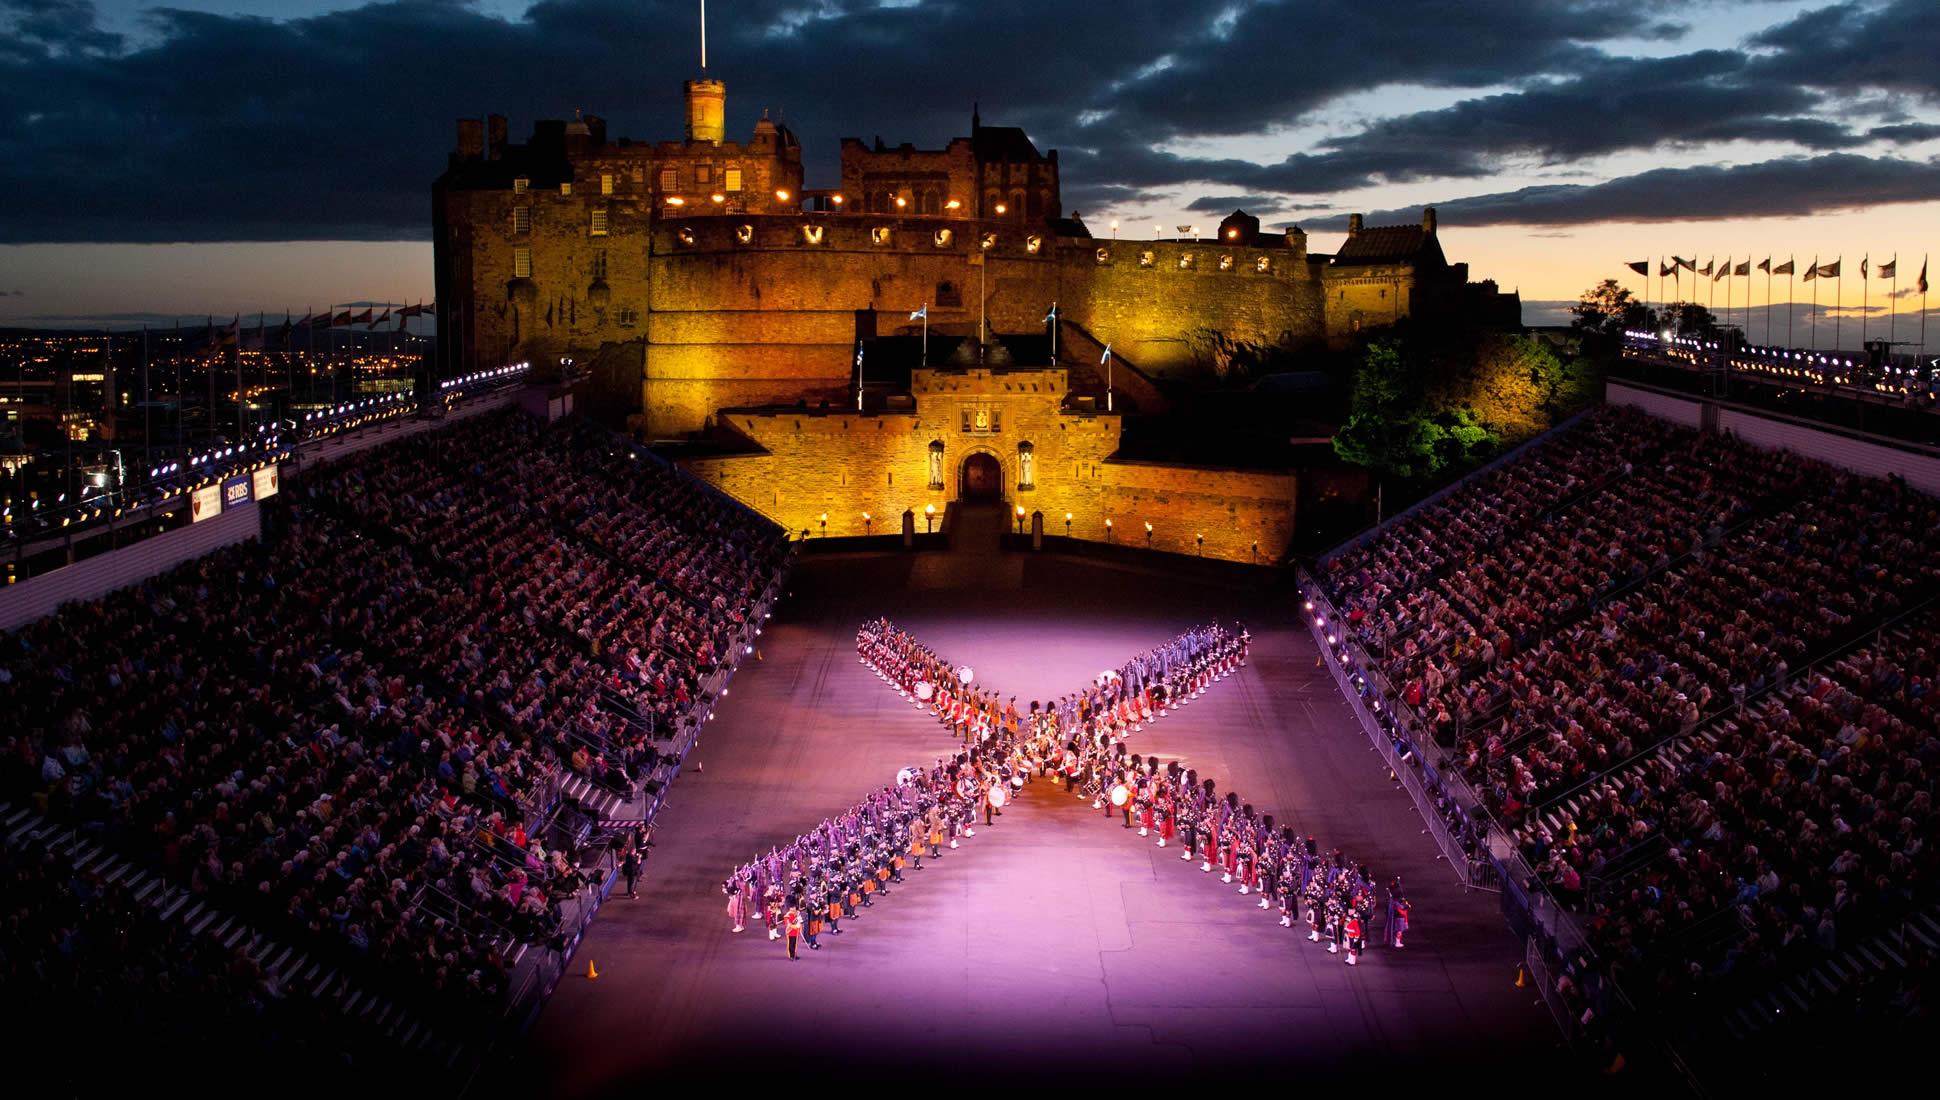 Things to do - The Royal Edinburgh Military Tattoo